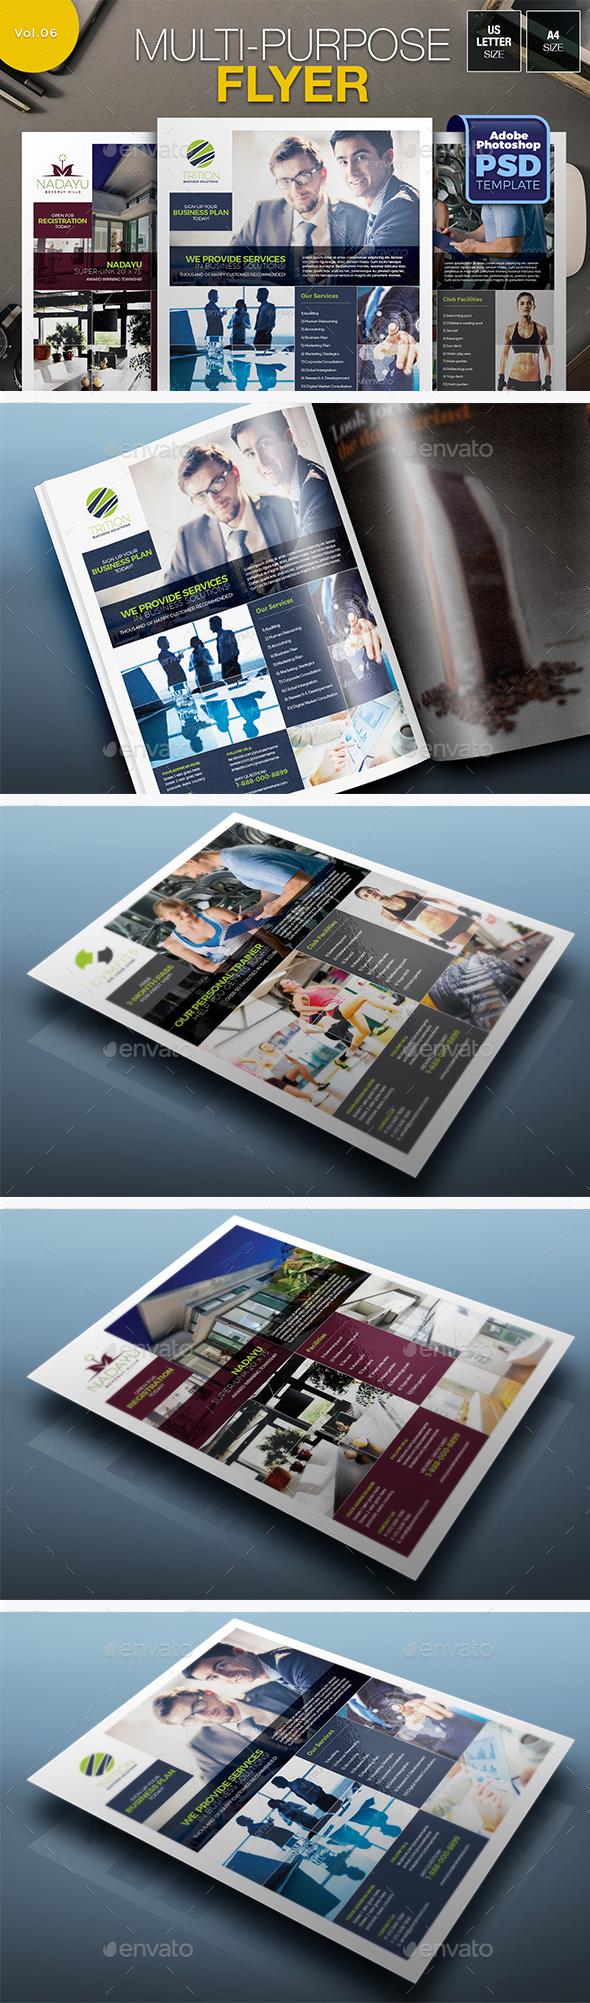 Multipurpose Flyer Vol.06 - Miscellaneous Events